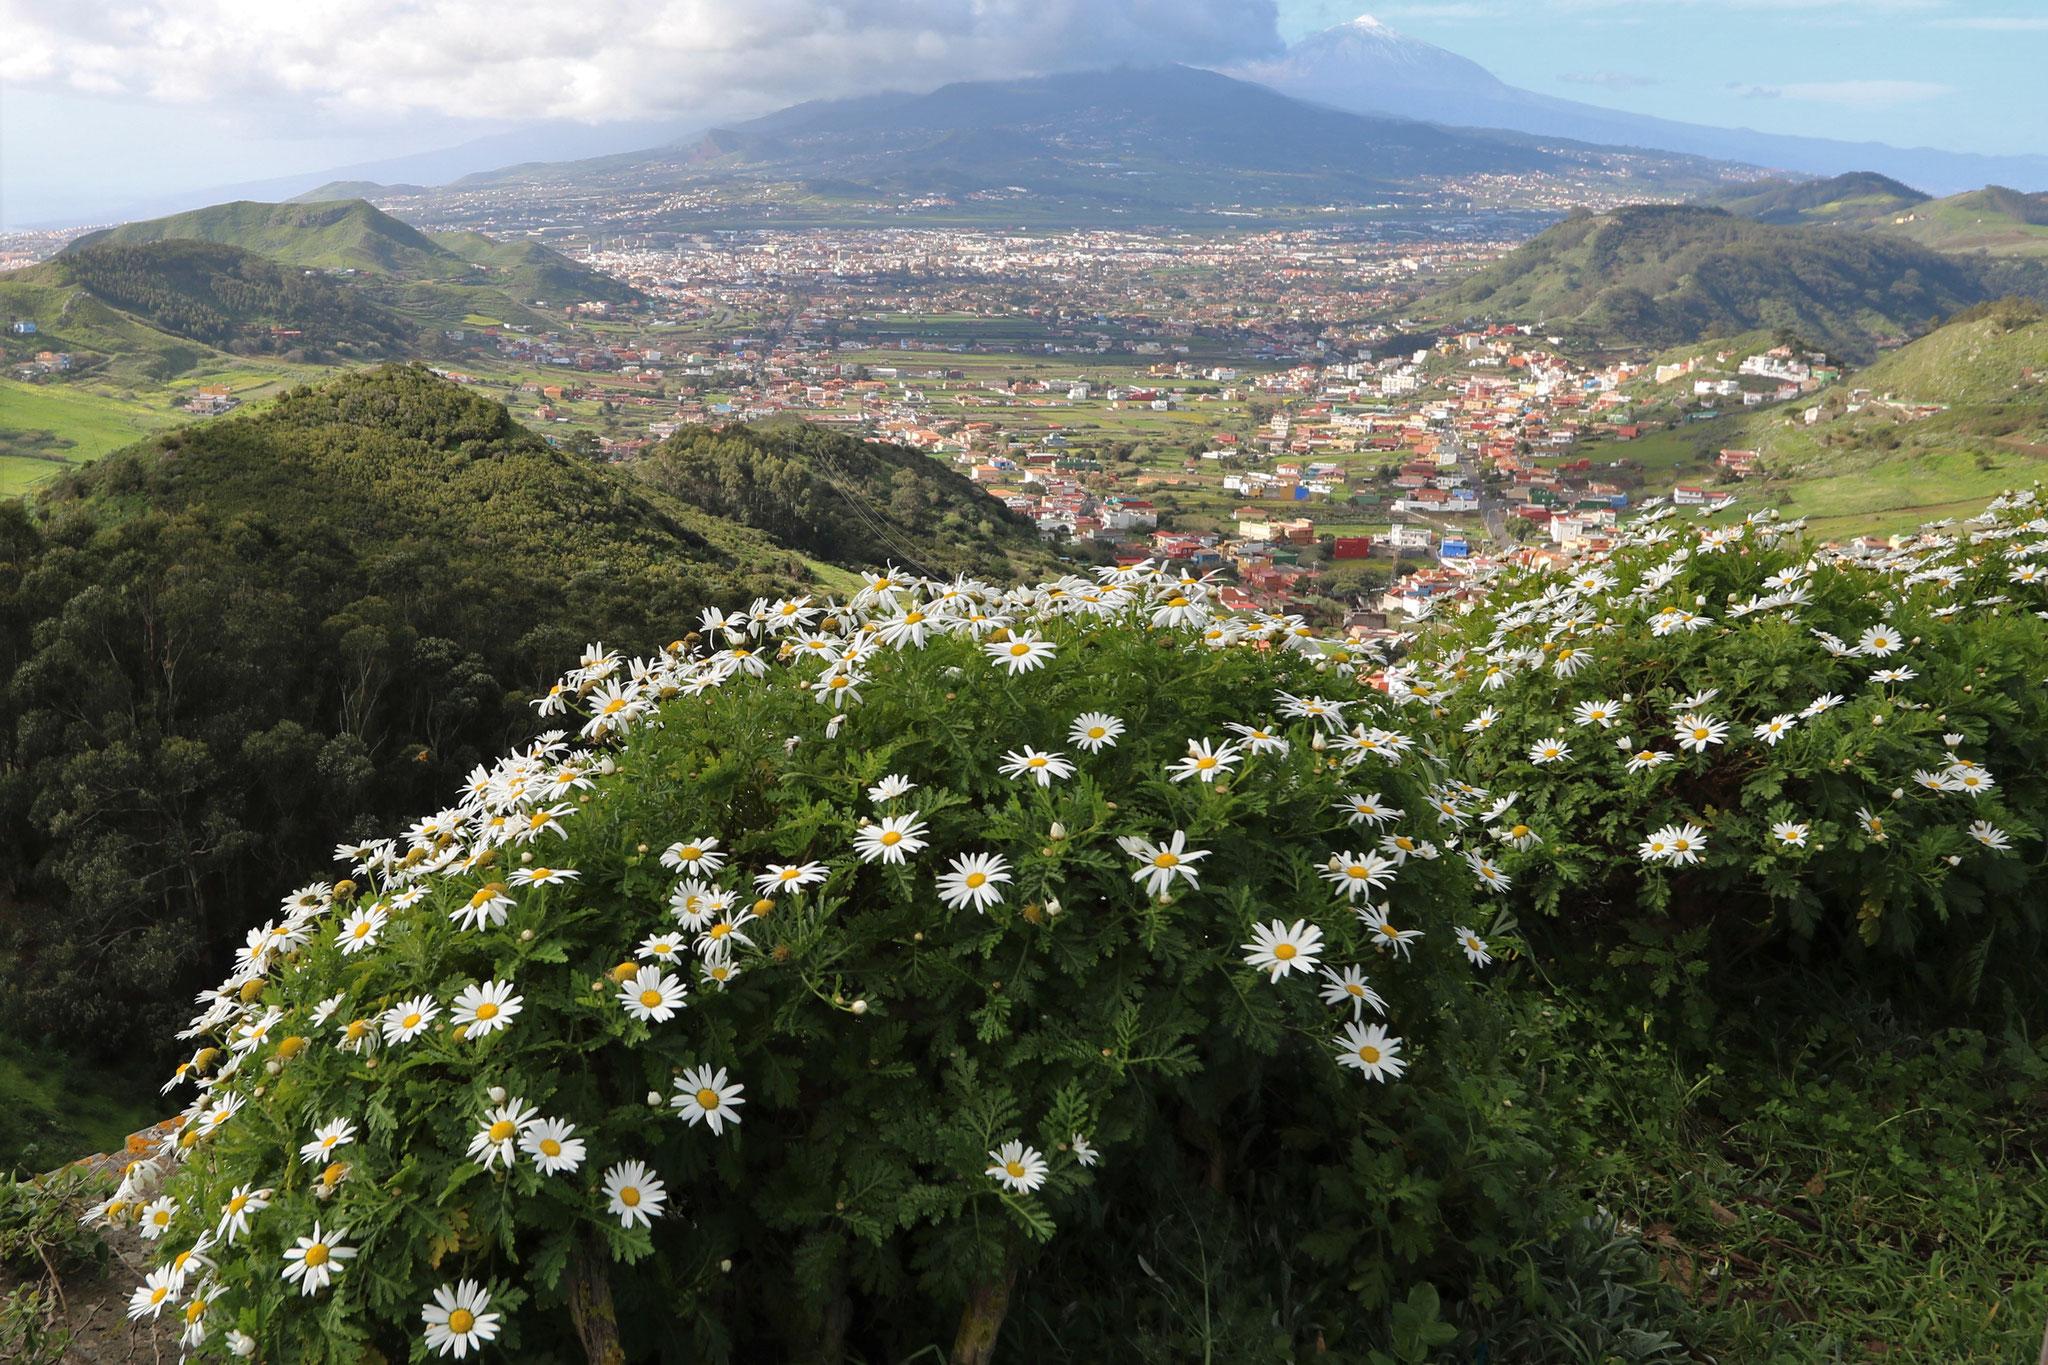 Aussichtspunkt Mirador Cruz del Carmen (Anaga-Gebirge) - Blick nach La Laguna